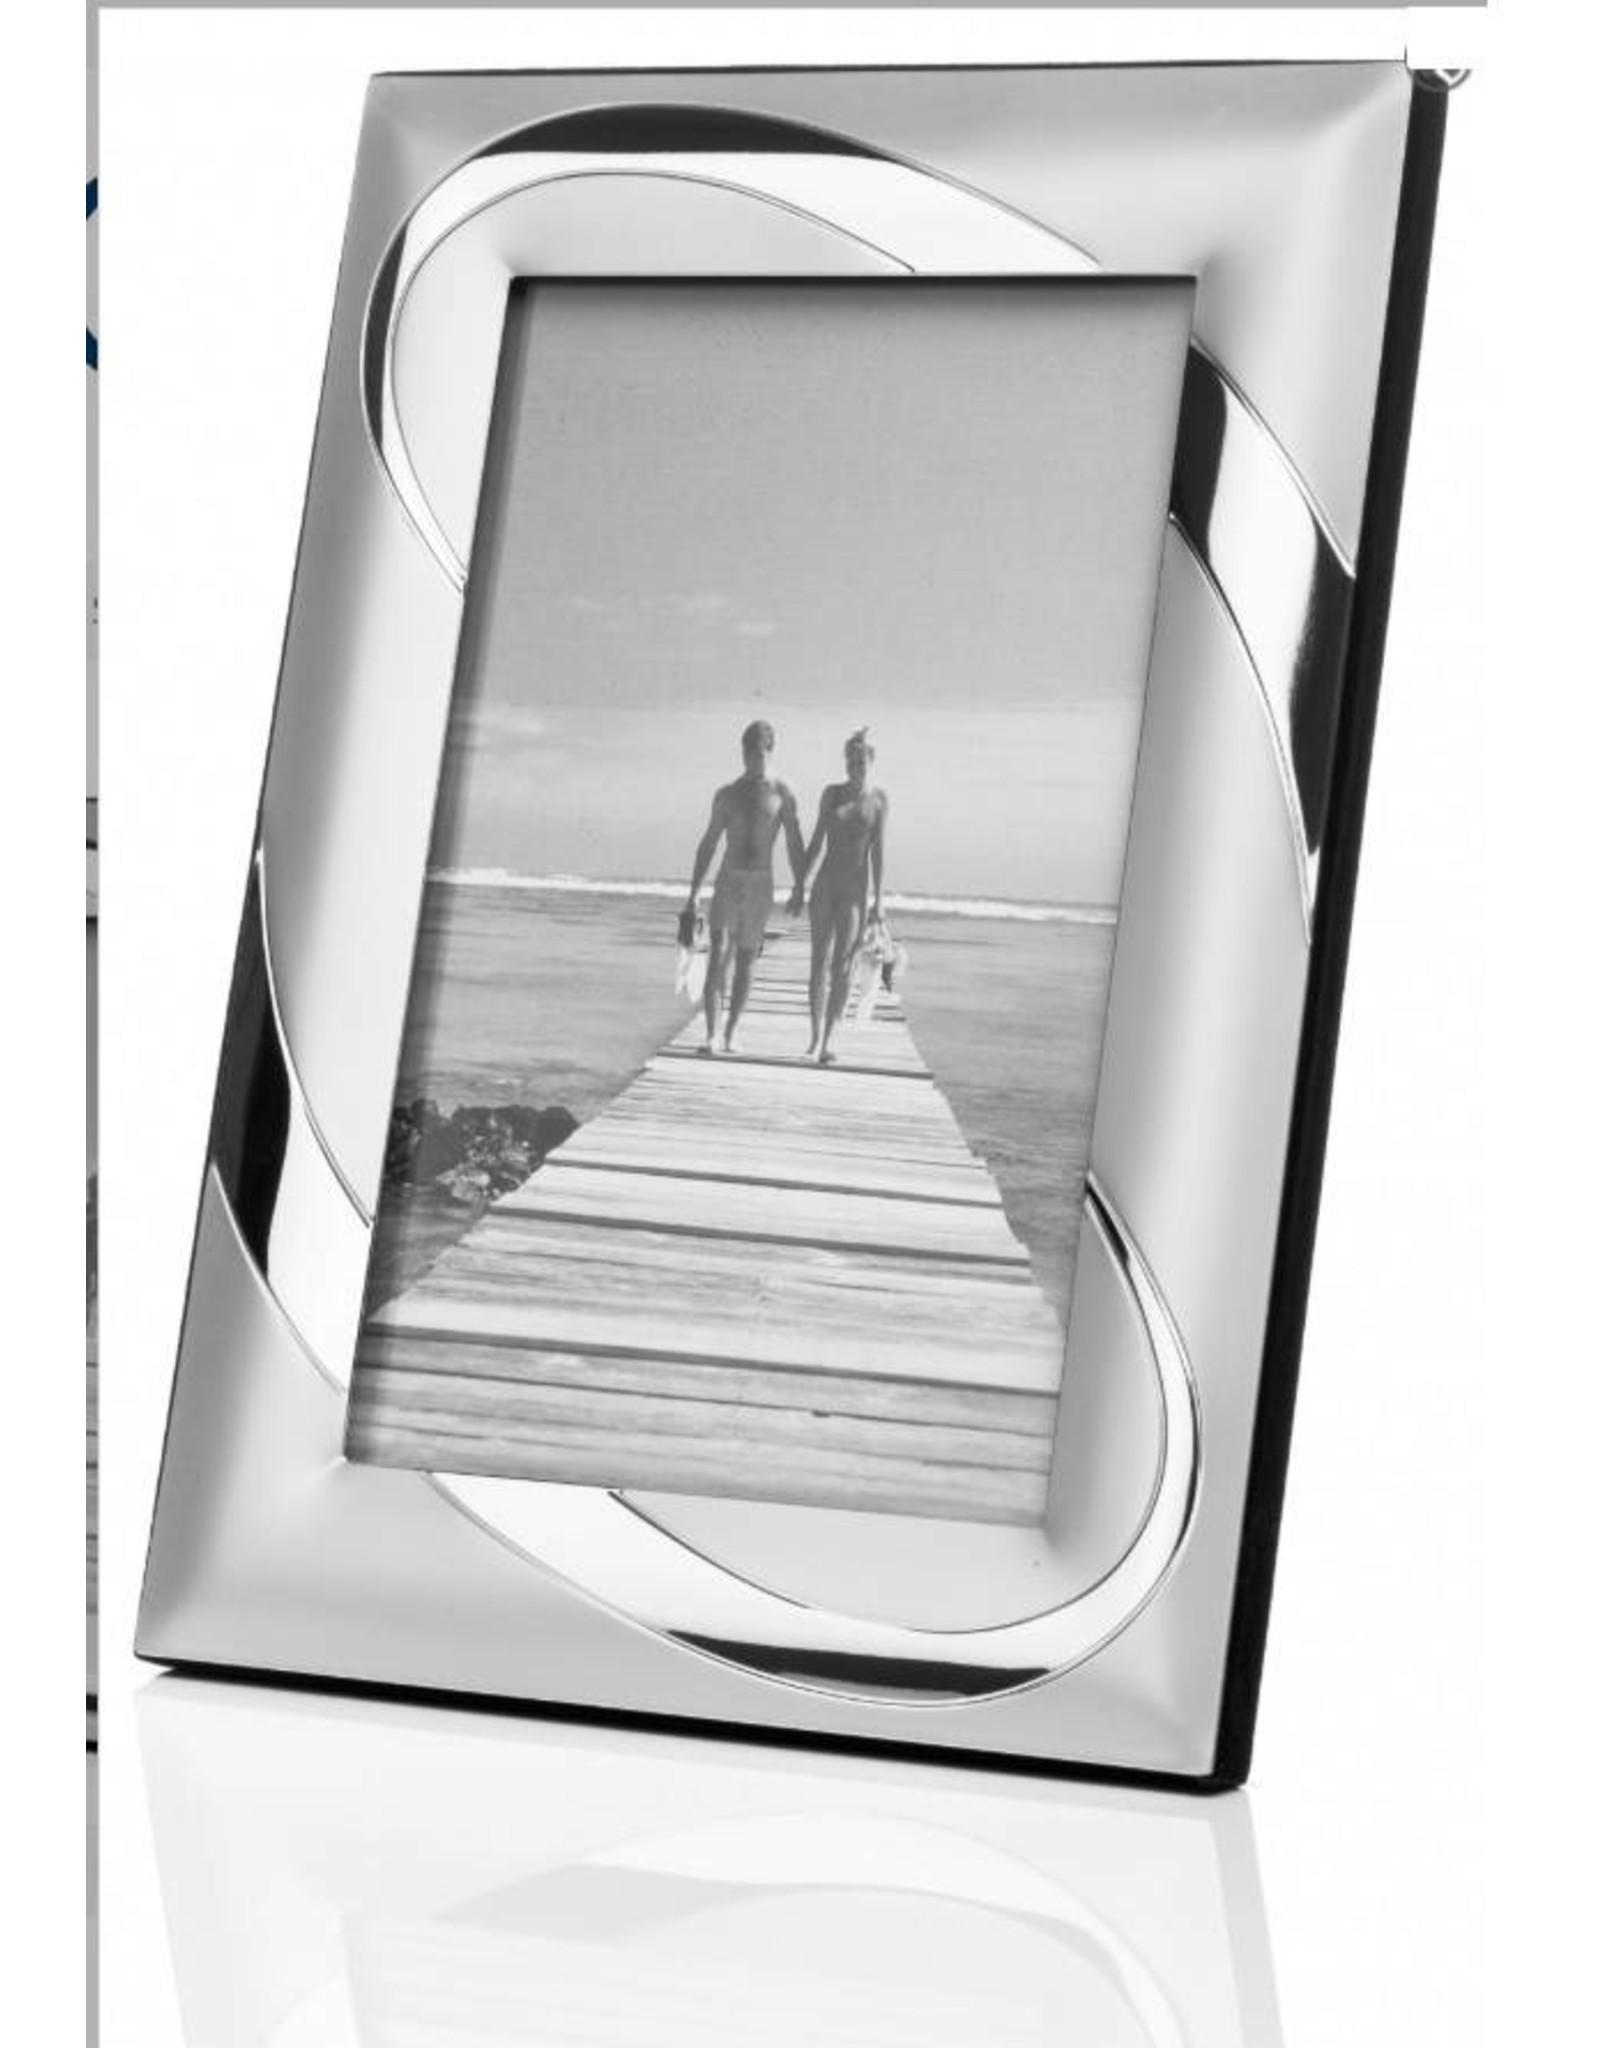 Fotolijst Melinda 9 x 13 cm